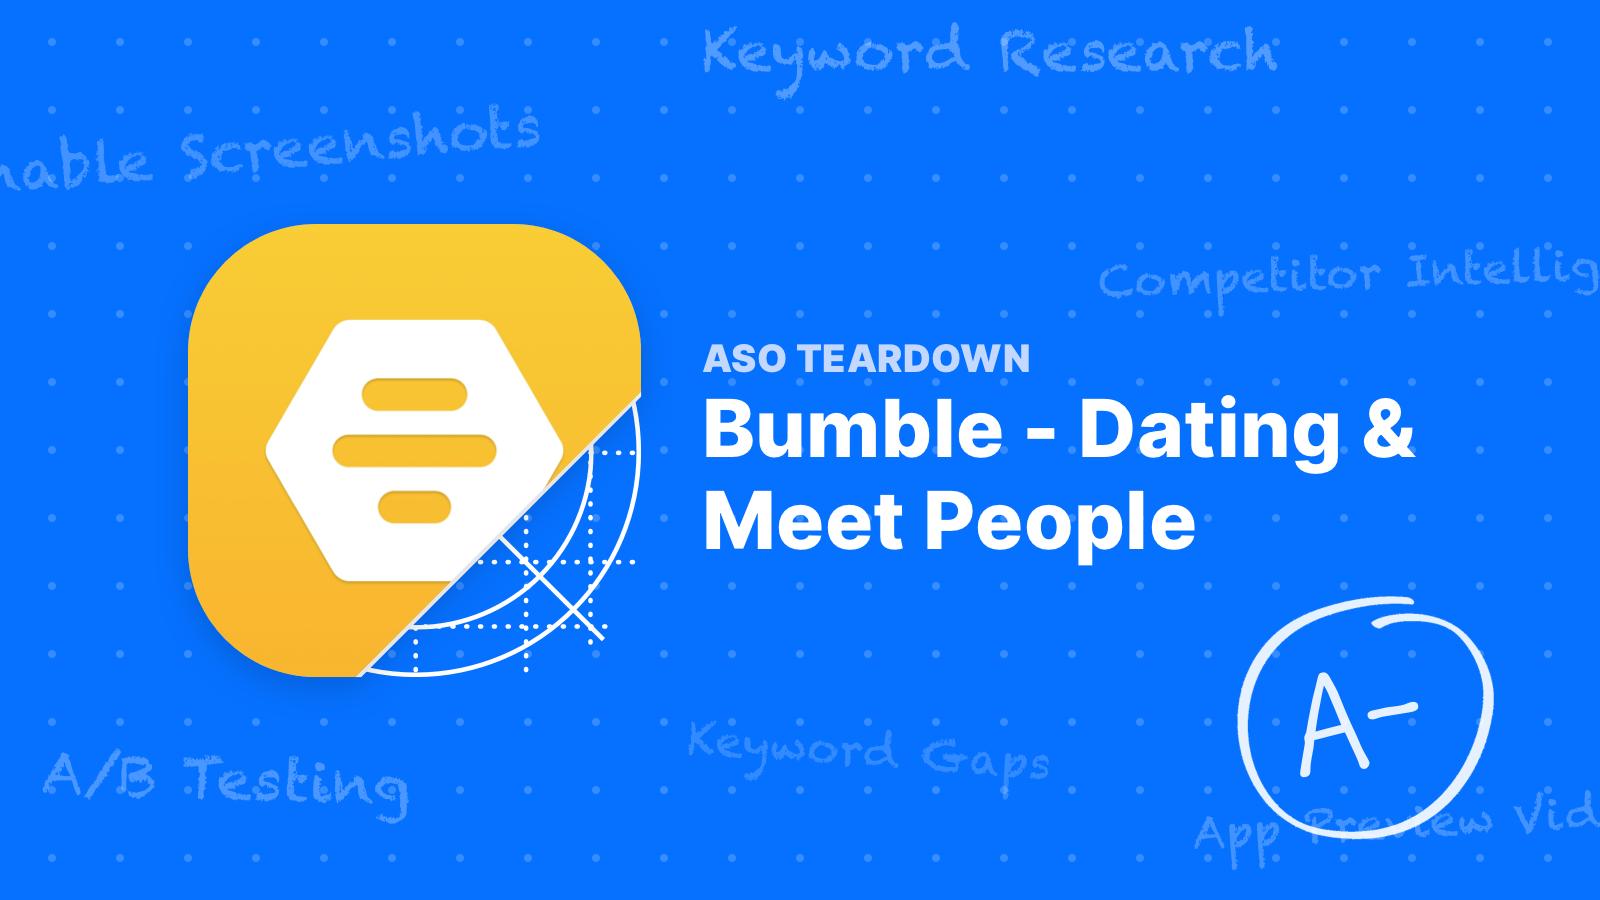 ASO Teardown - Bumble's Gunning for Tinder